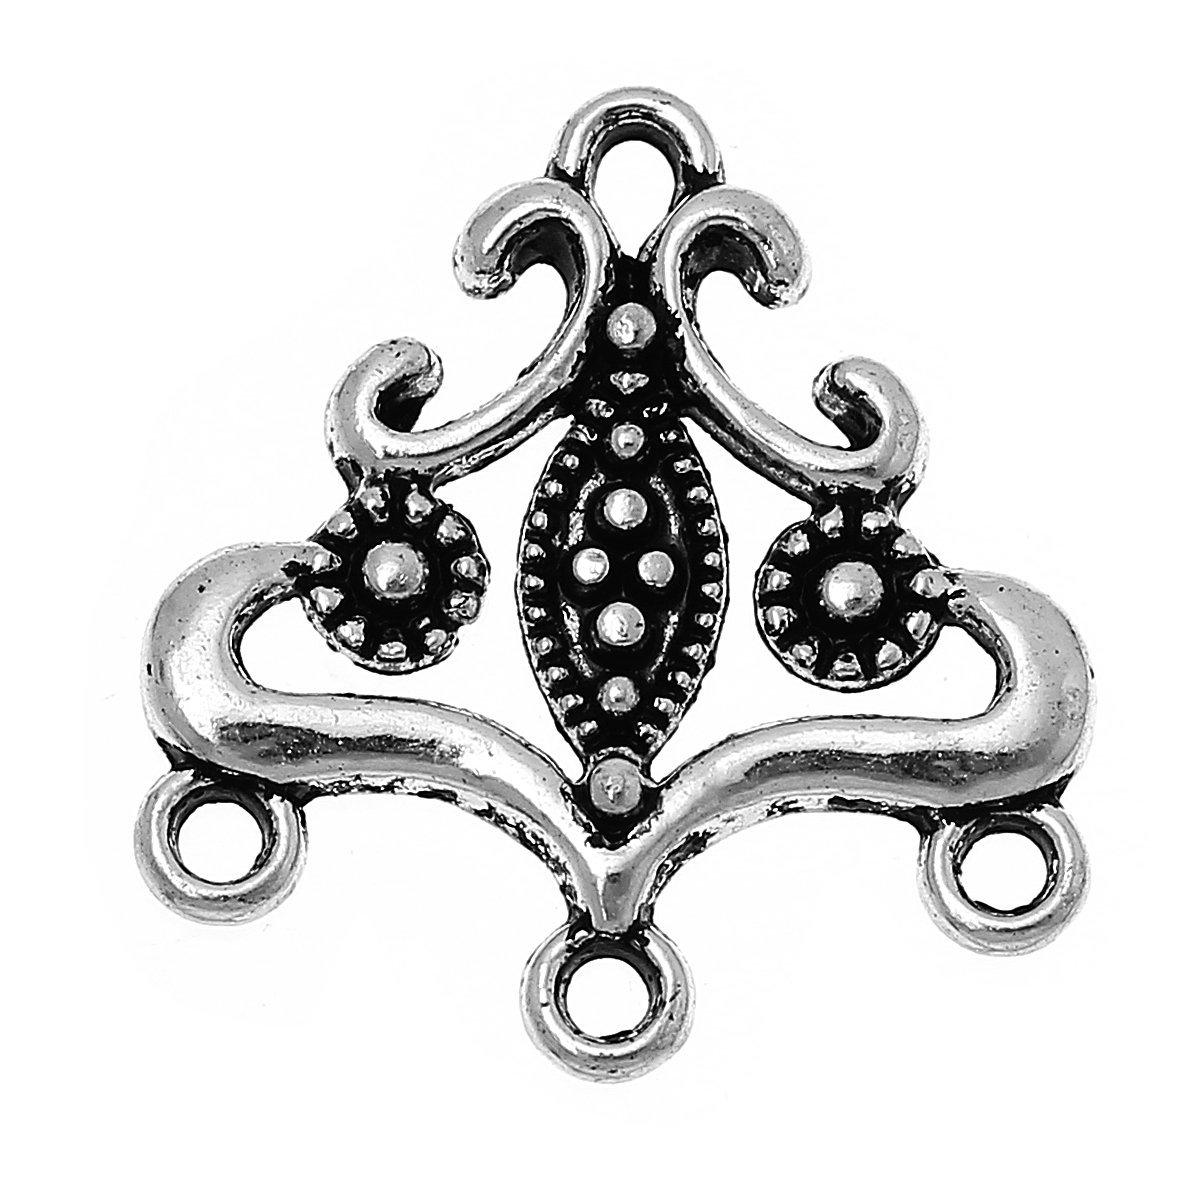 20 Tibetan Style Antique Silver 22x13mm Connectors Findings